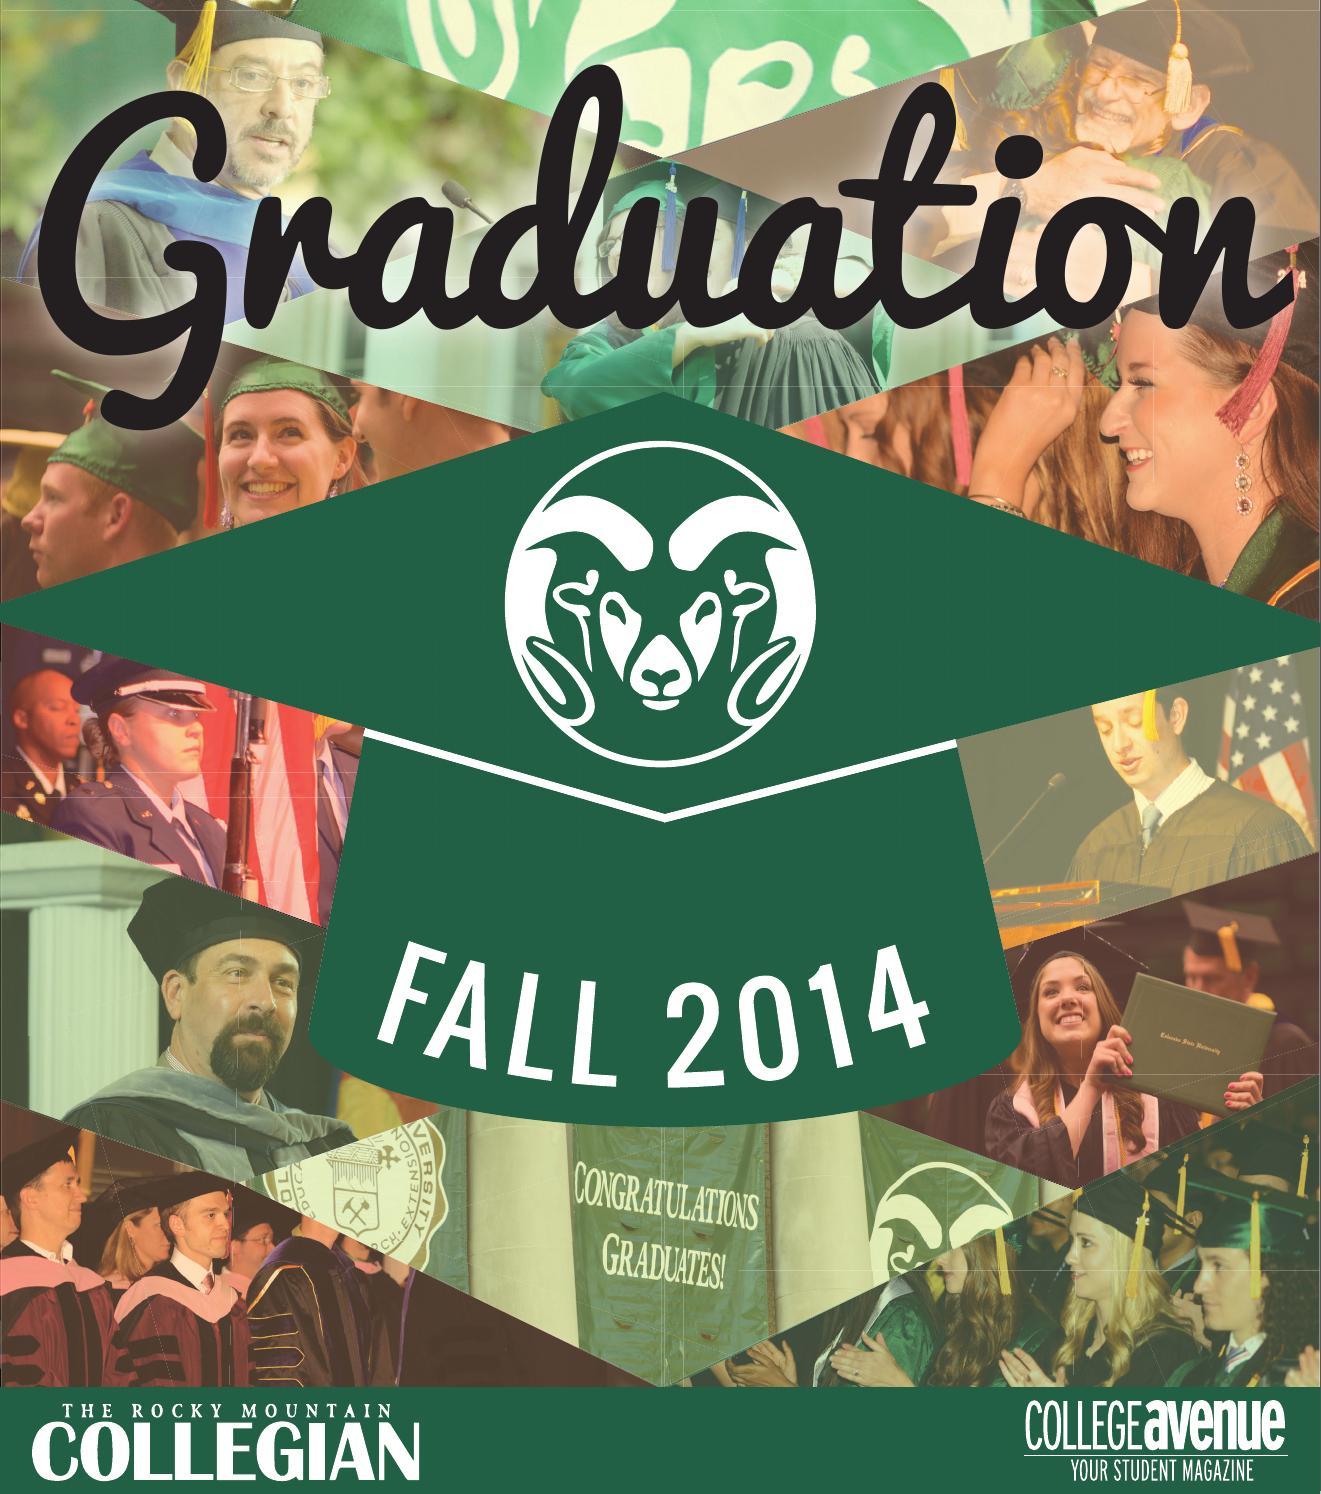 Colorado State Graduation Guide